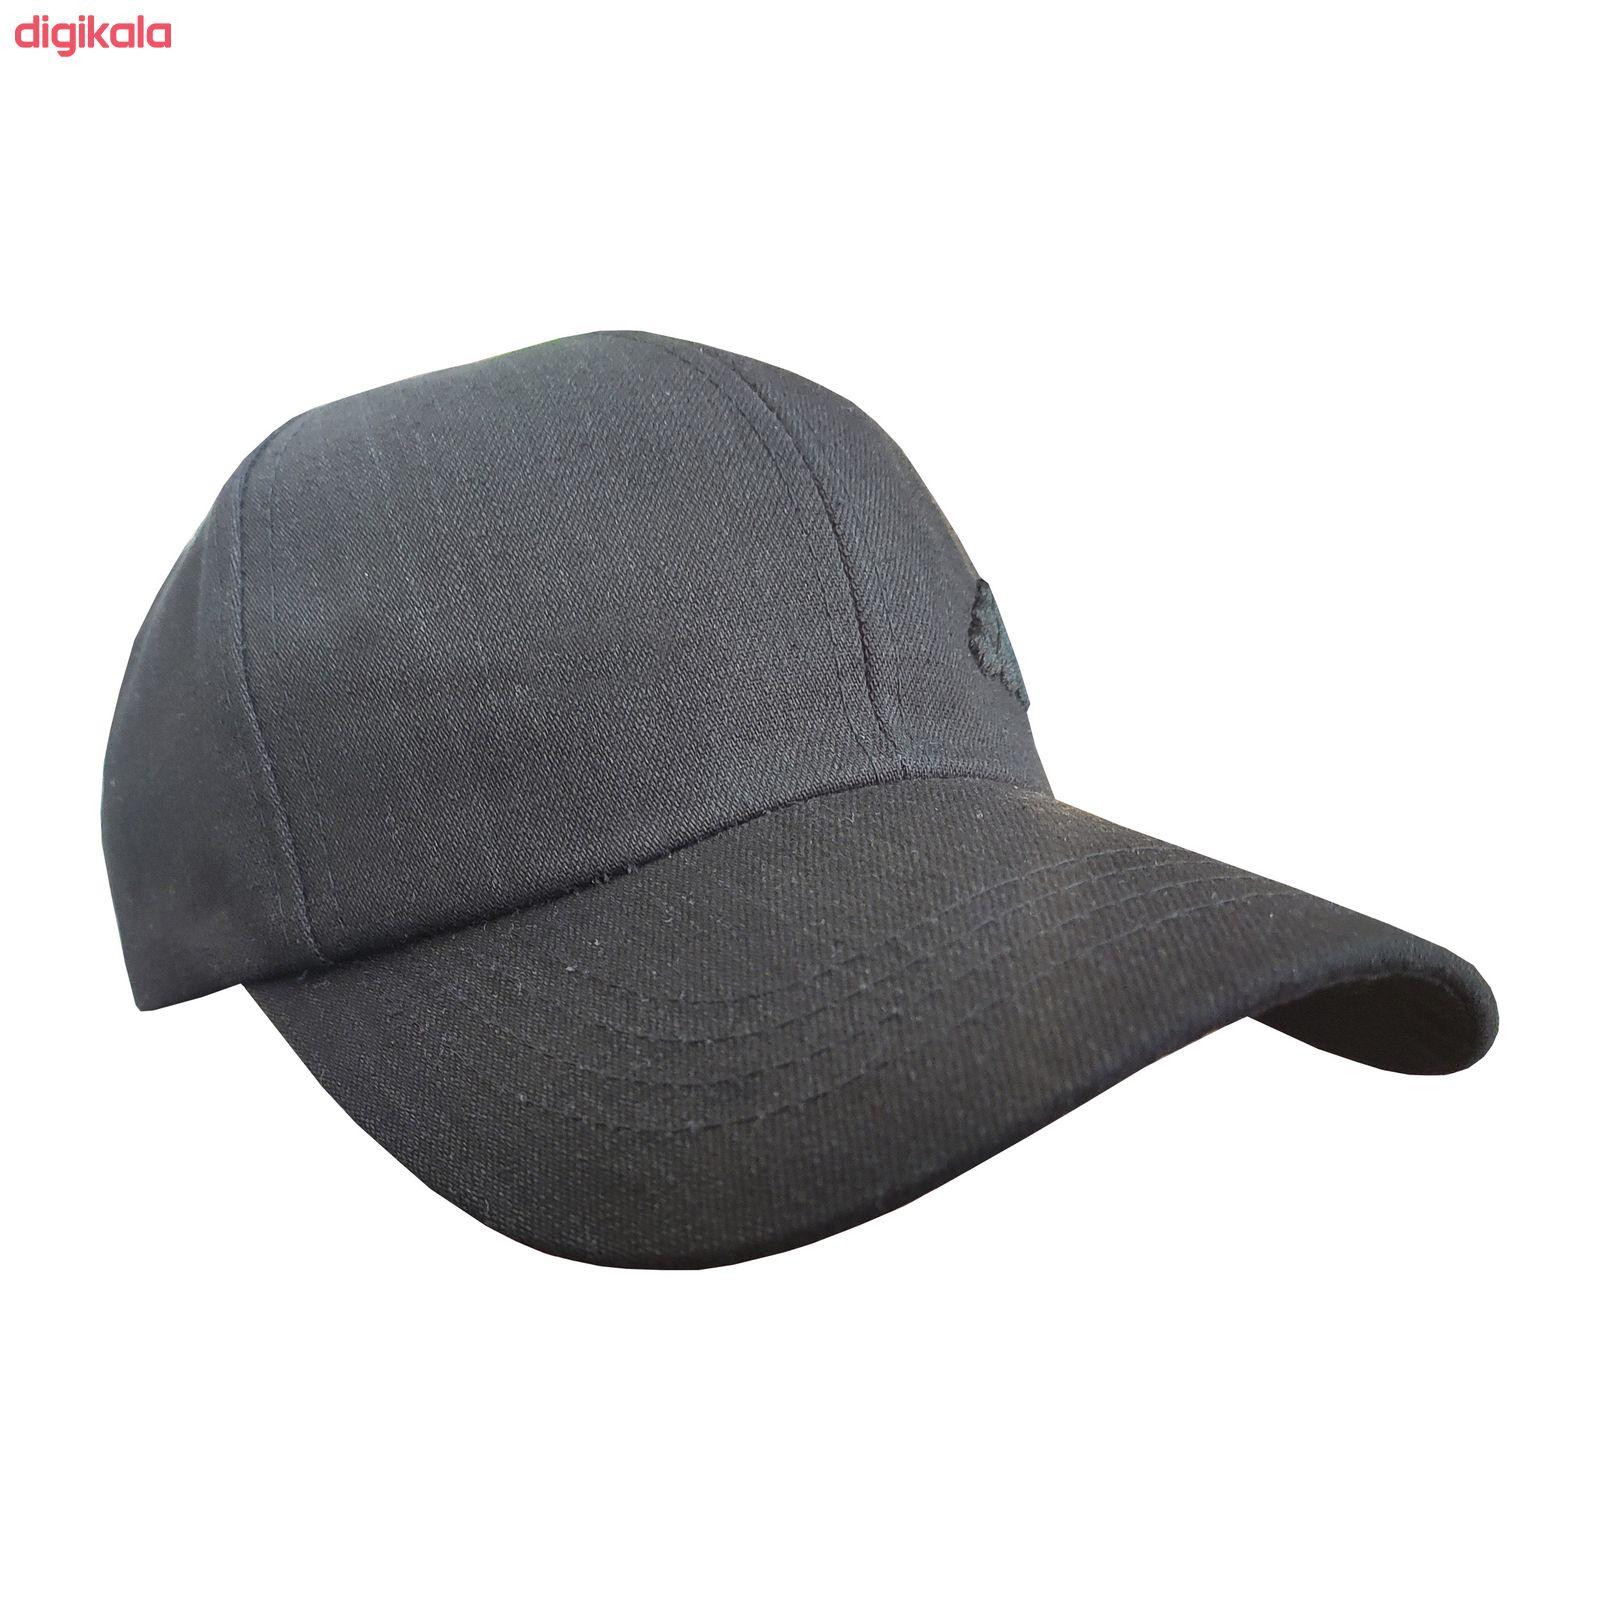 کلاه کپ مردانه مدل 3LE کد 30324 main 1 3